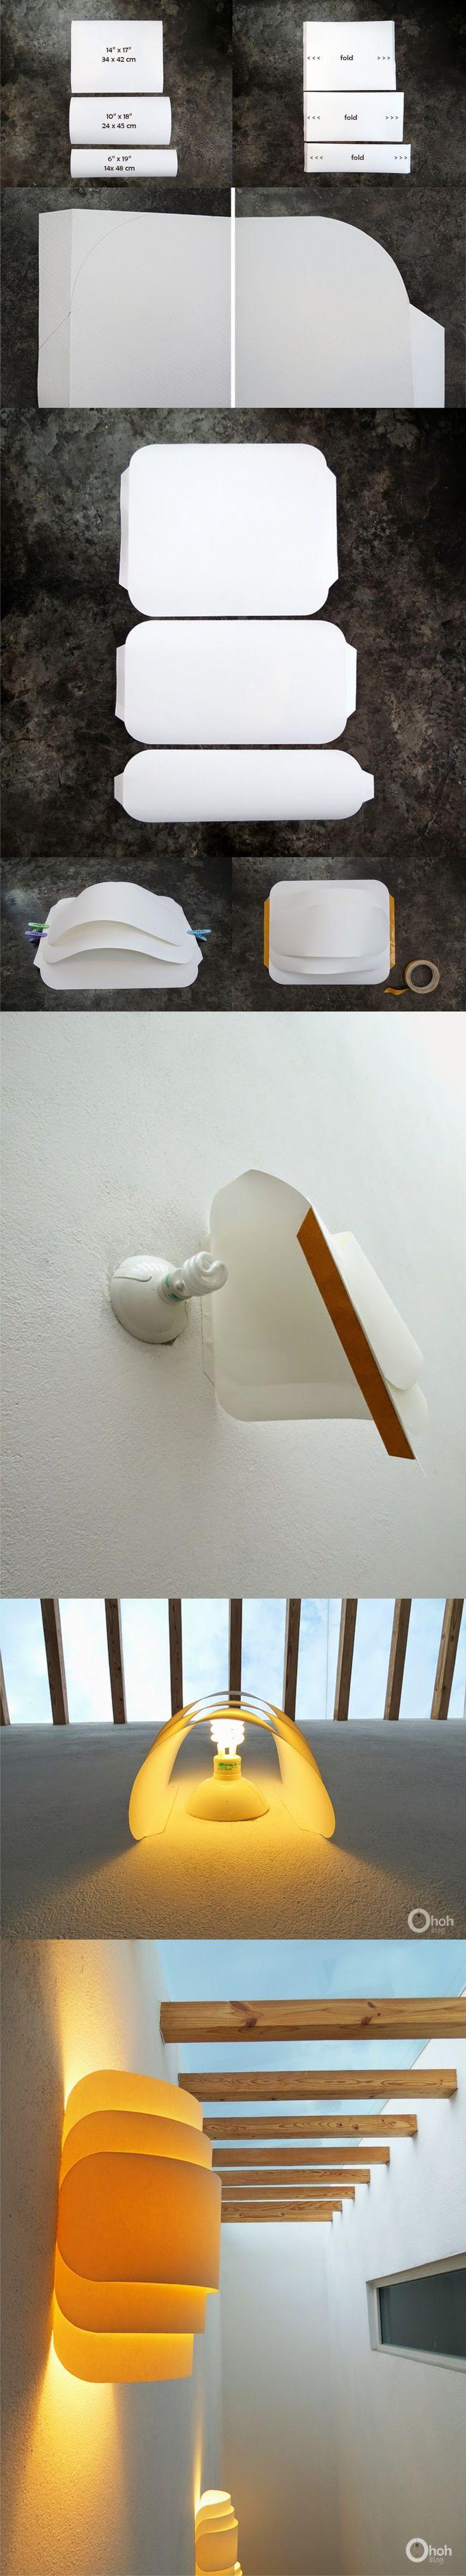 lampara pared papel DIY muy ingenioso 2